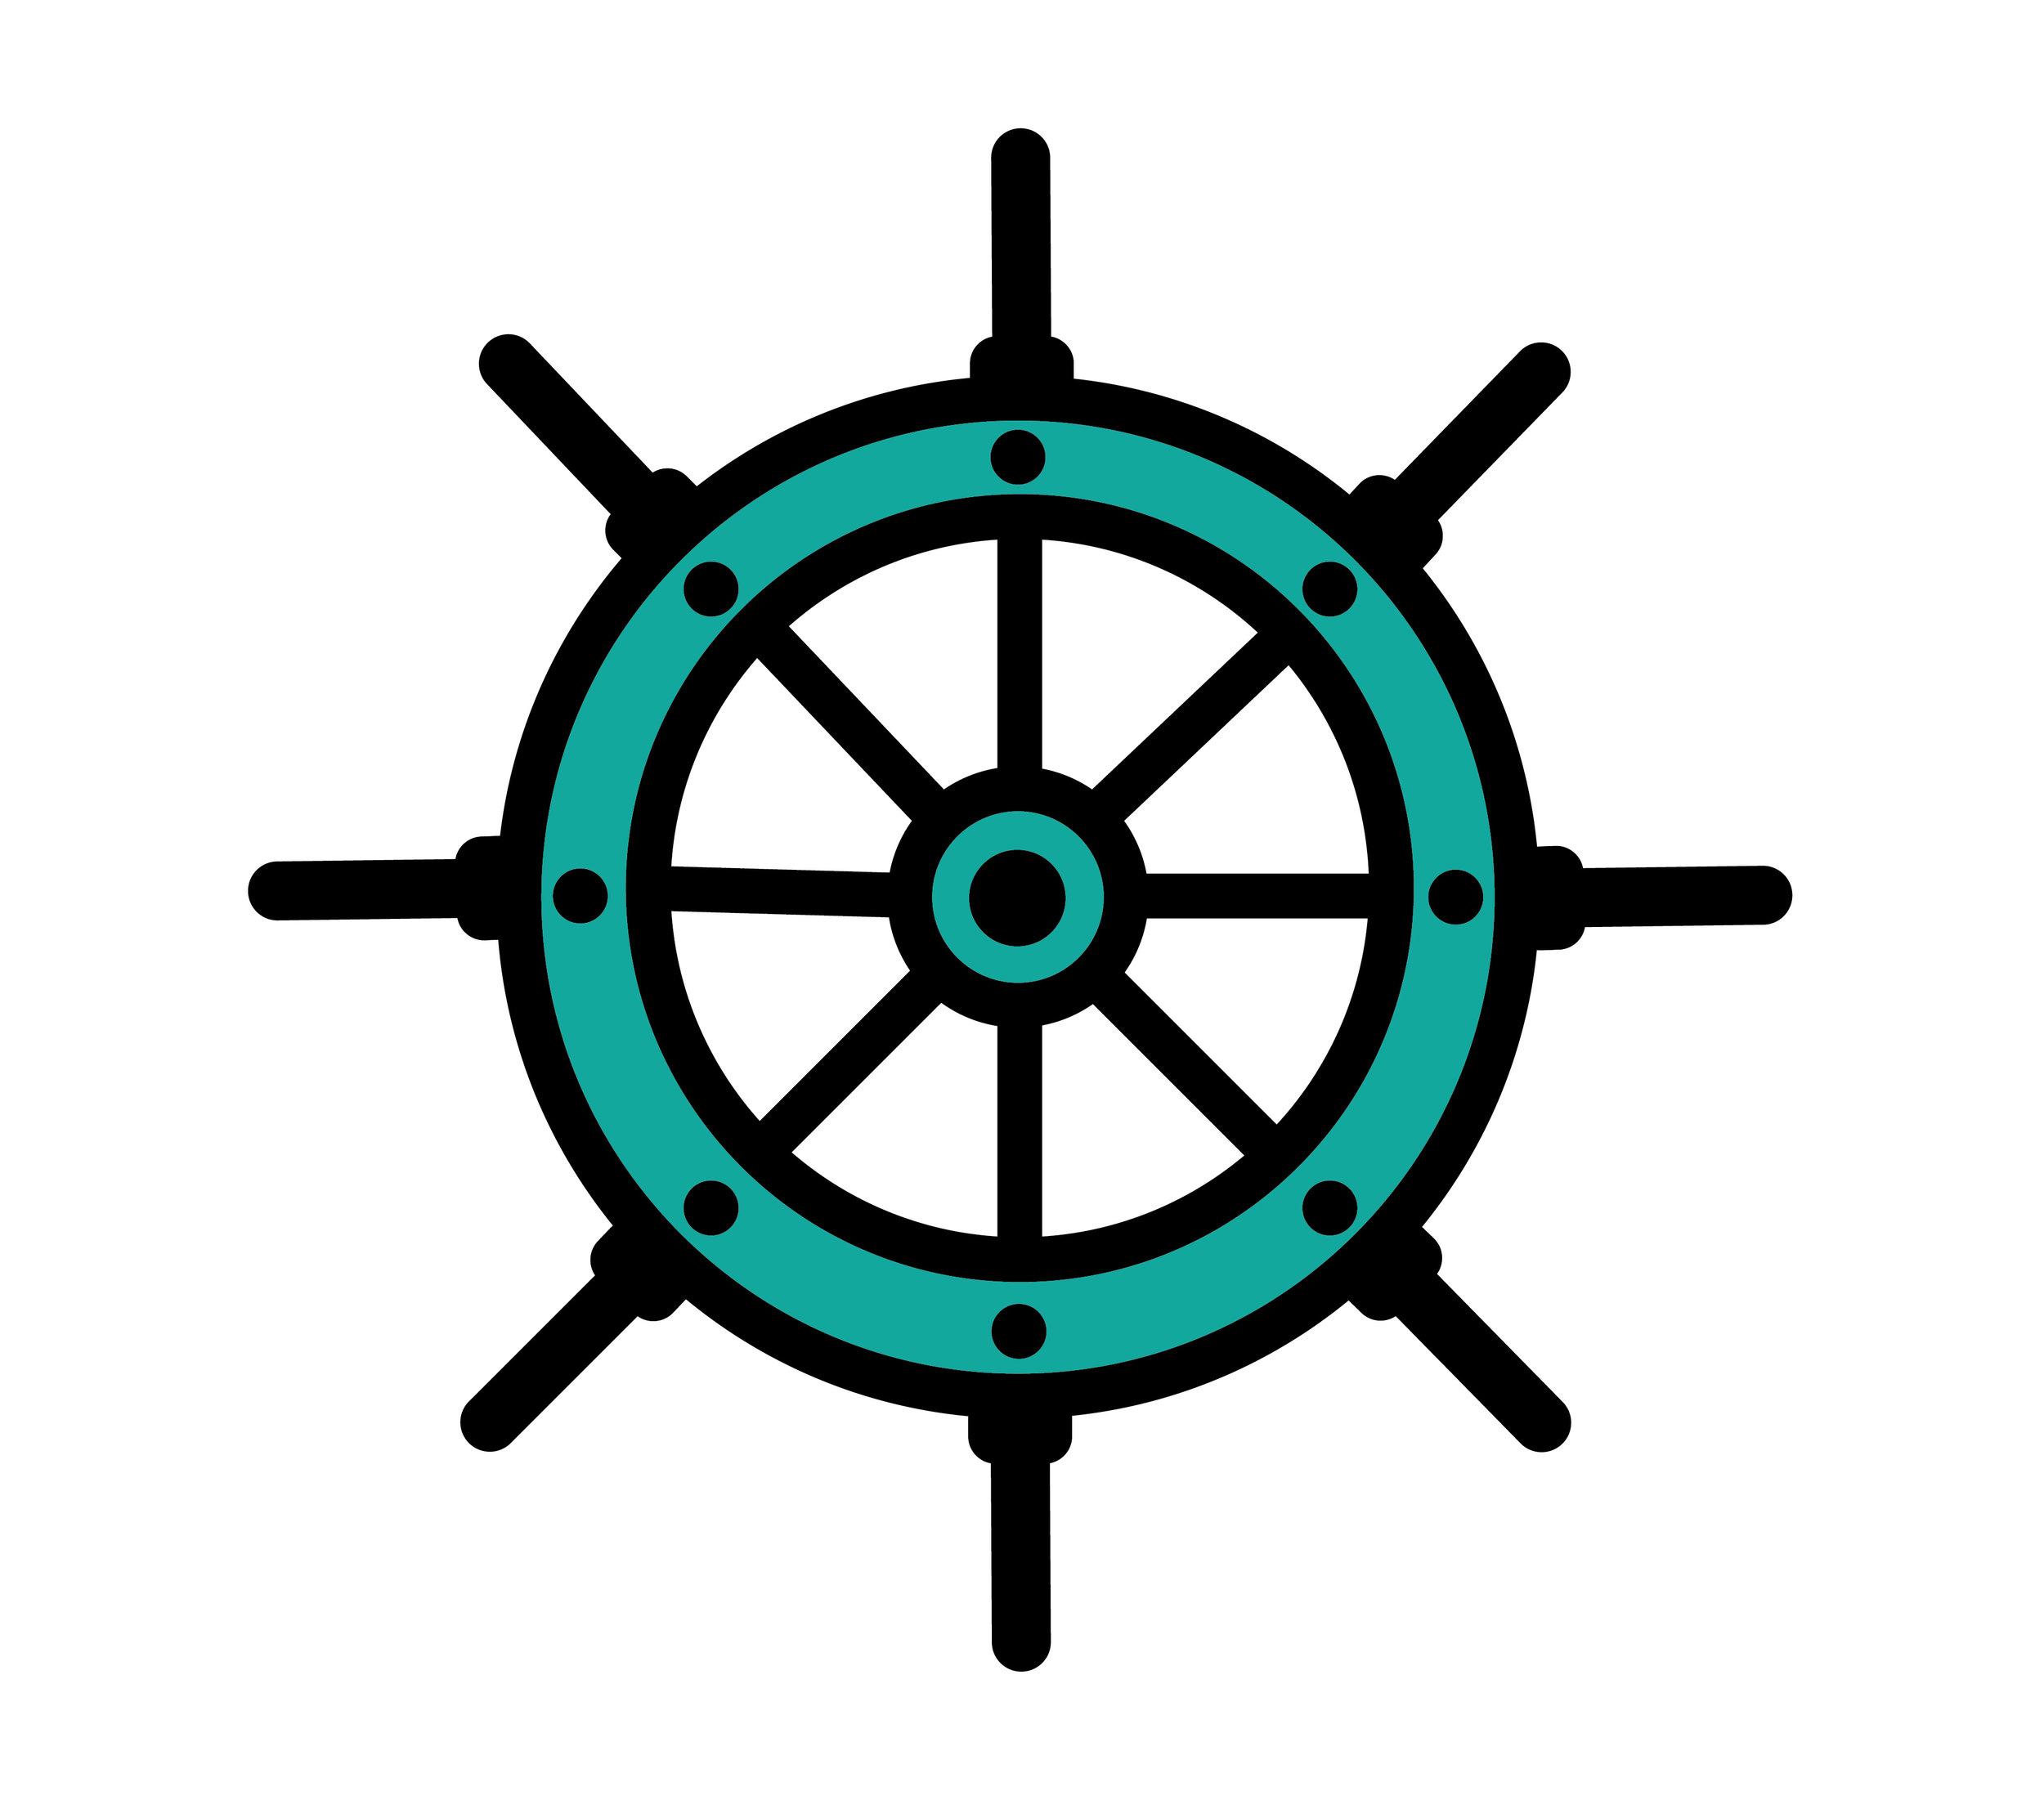 helm graphic-01.jpg